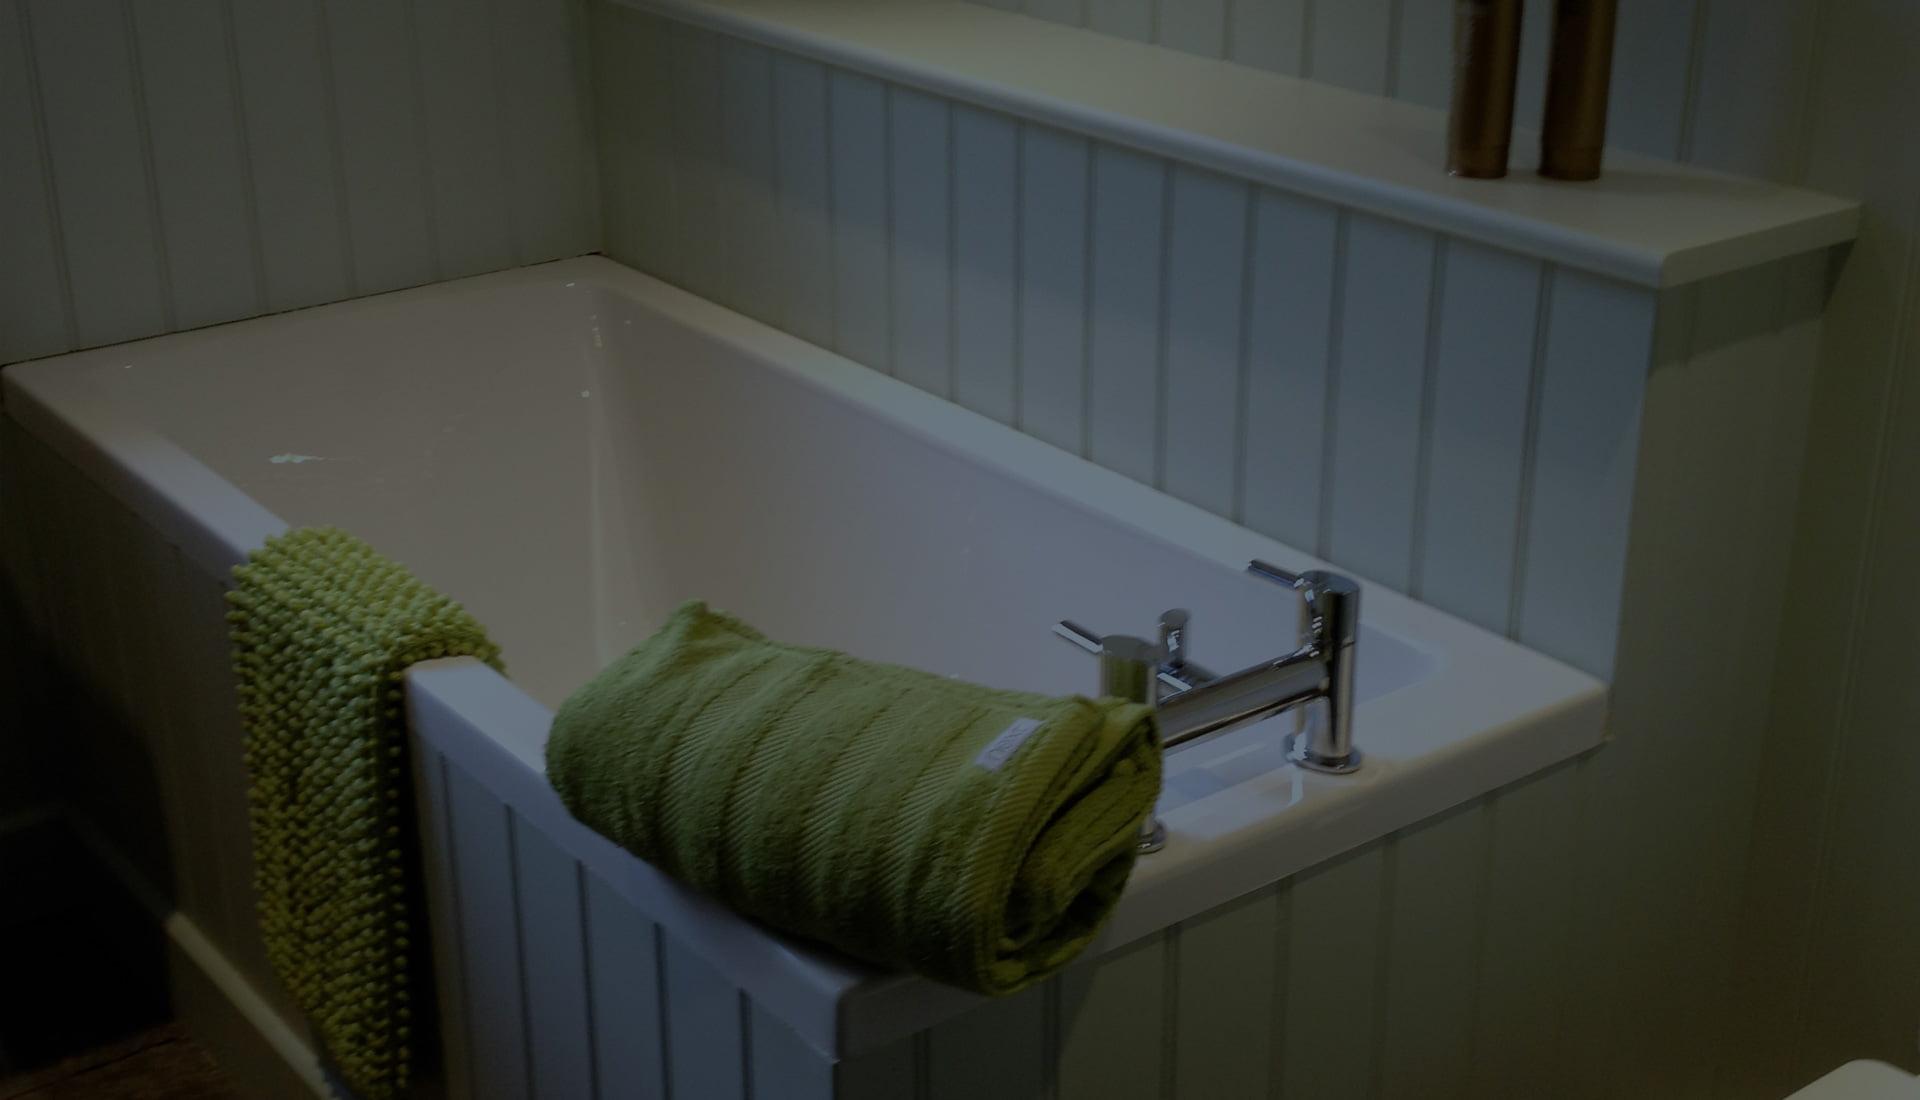 Freshwoods-Bathroom-Installation-Somerset